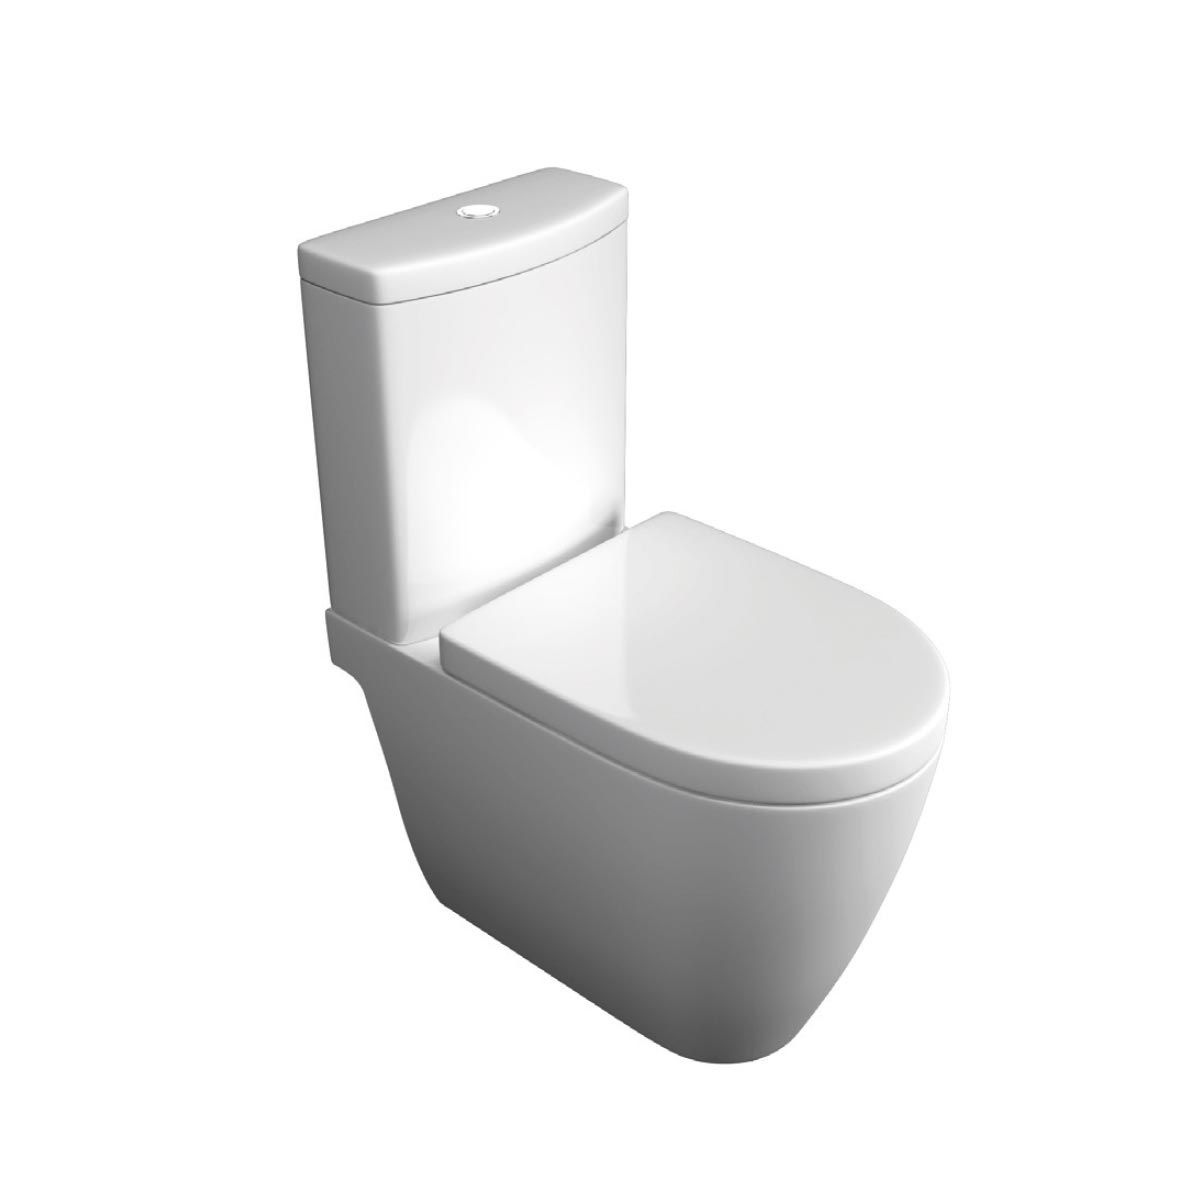 Kartell K-VIT Genoa Close Coupled Toilet with Slim D Wrapover Seat (UF)